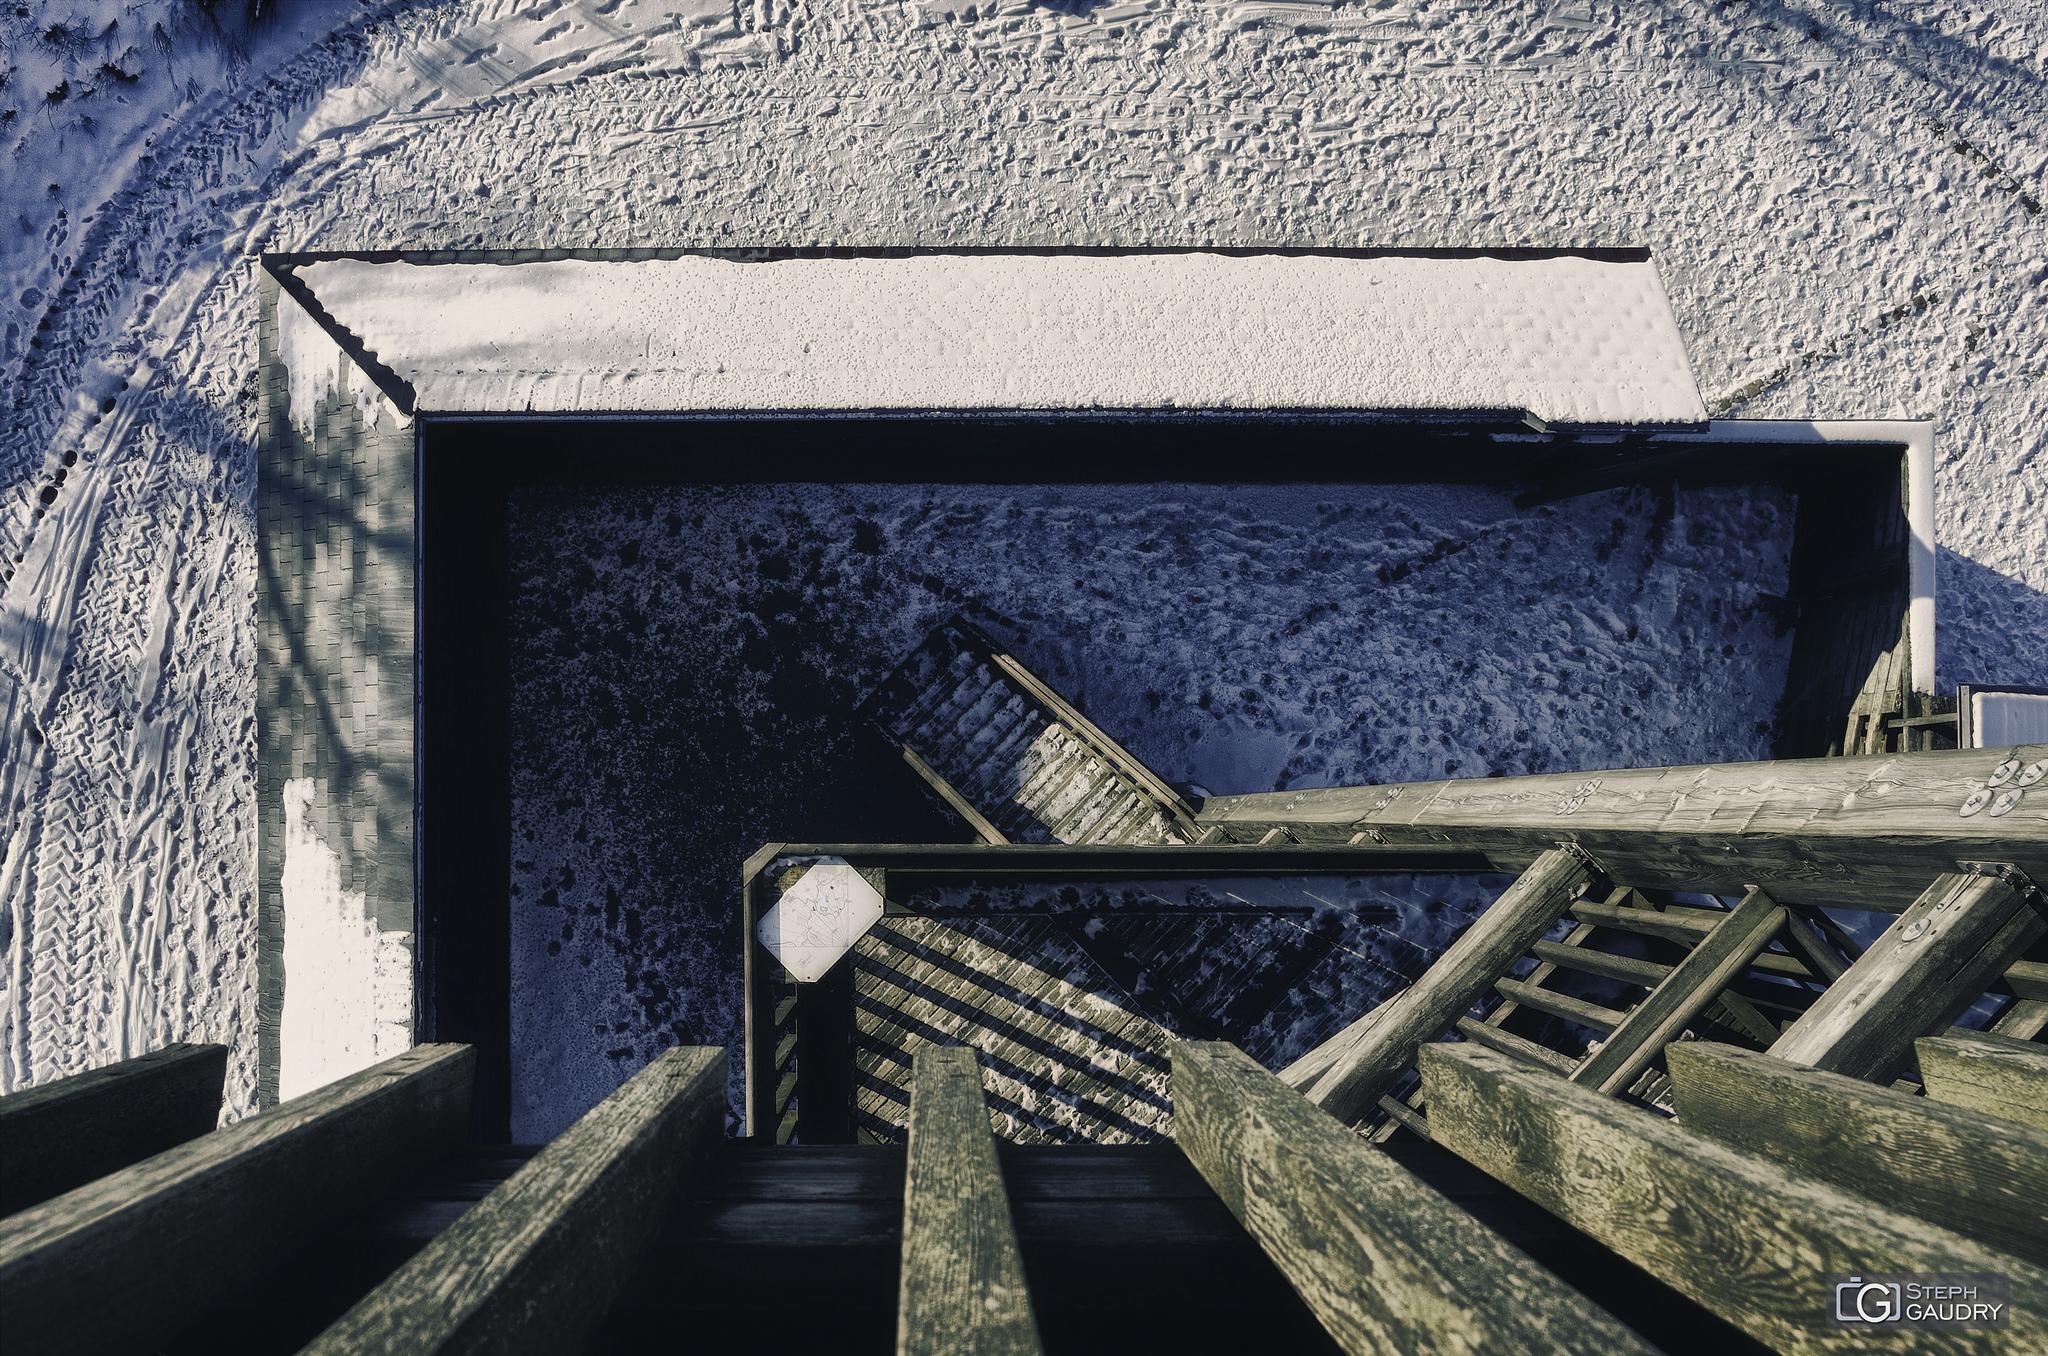 La tour de Berinzenne [Klik om de diavoorstelling te starten]